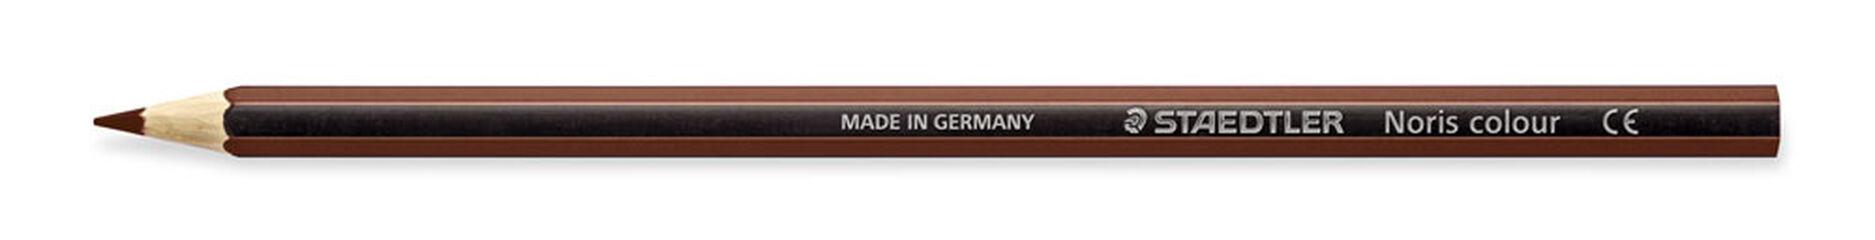 Lápices de colores Staedtler Colour Marrón 12 unidades